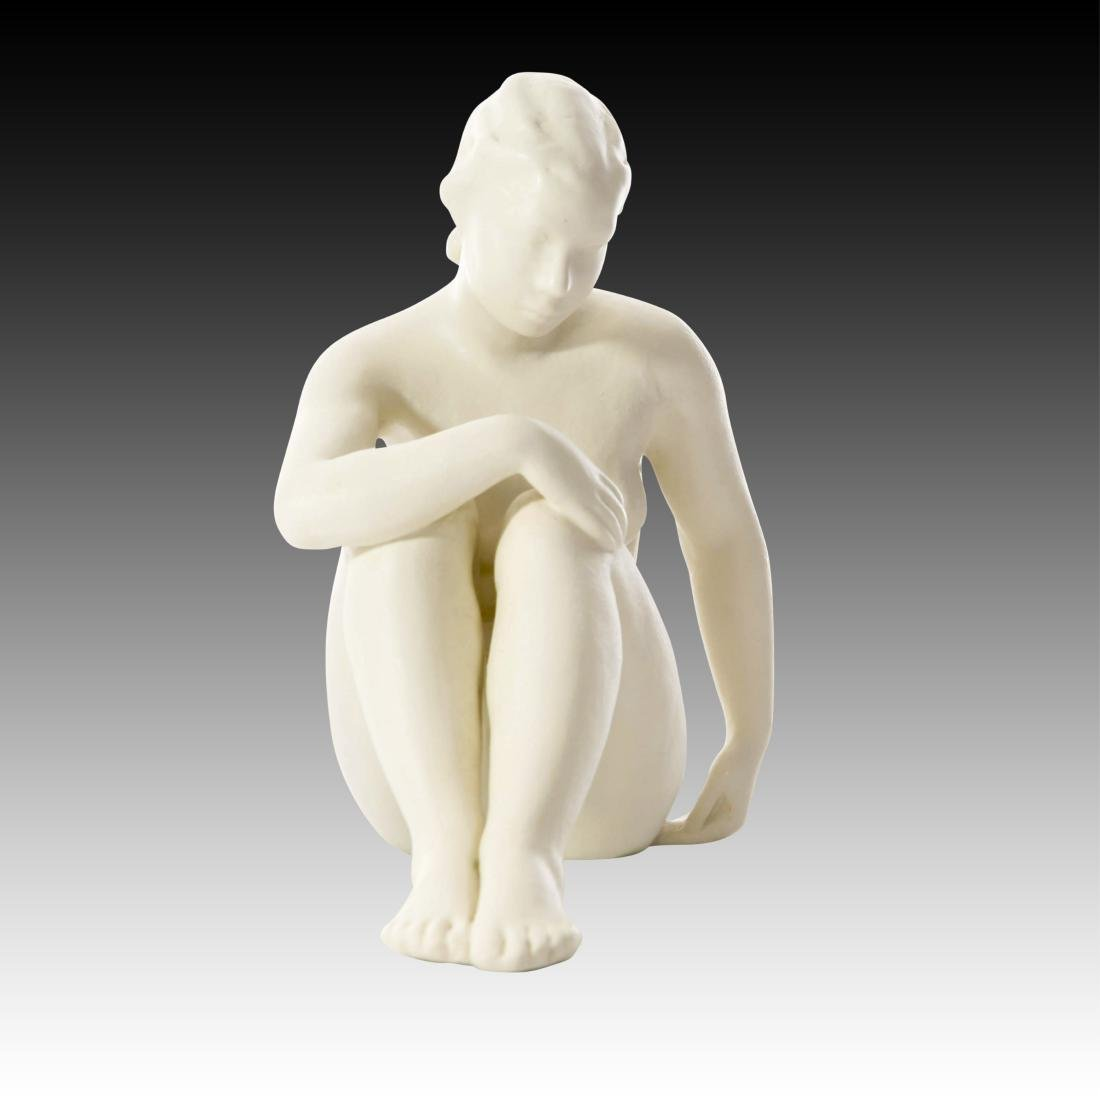 Rosenthal Nude Female Bisque Finish Figurine